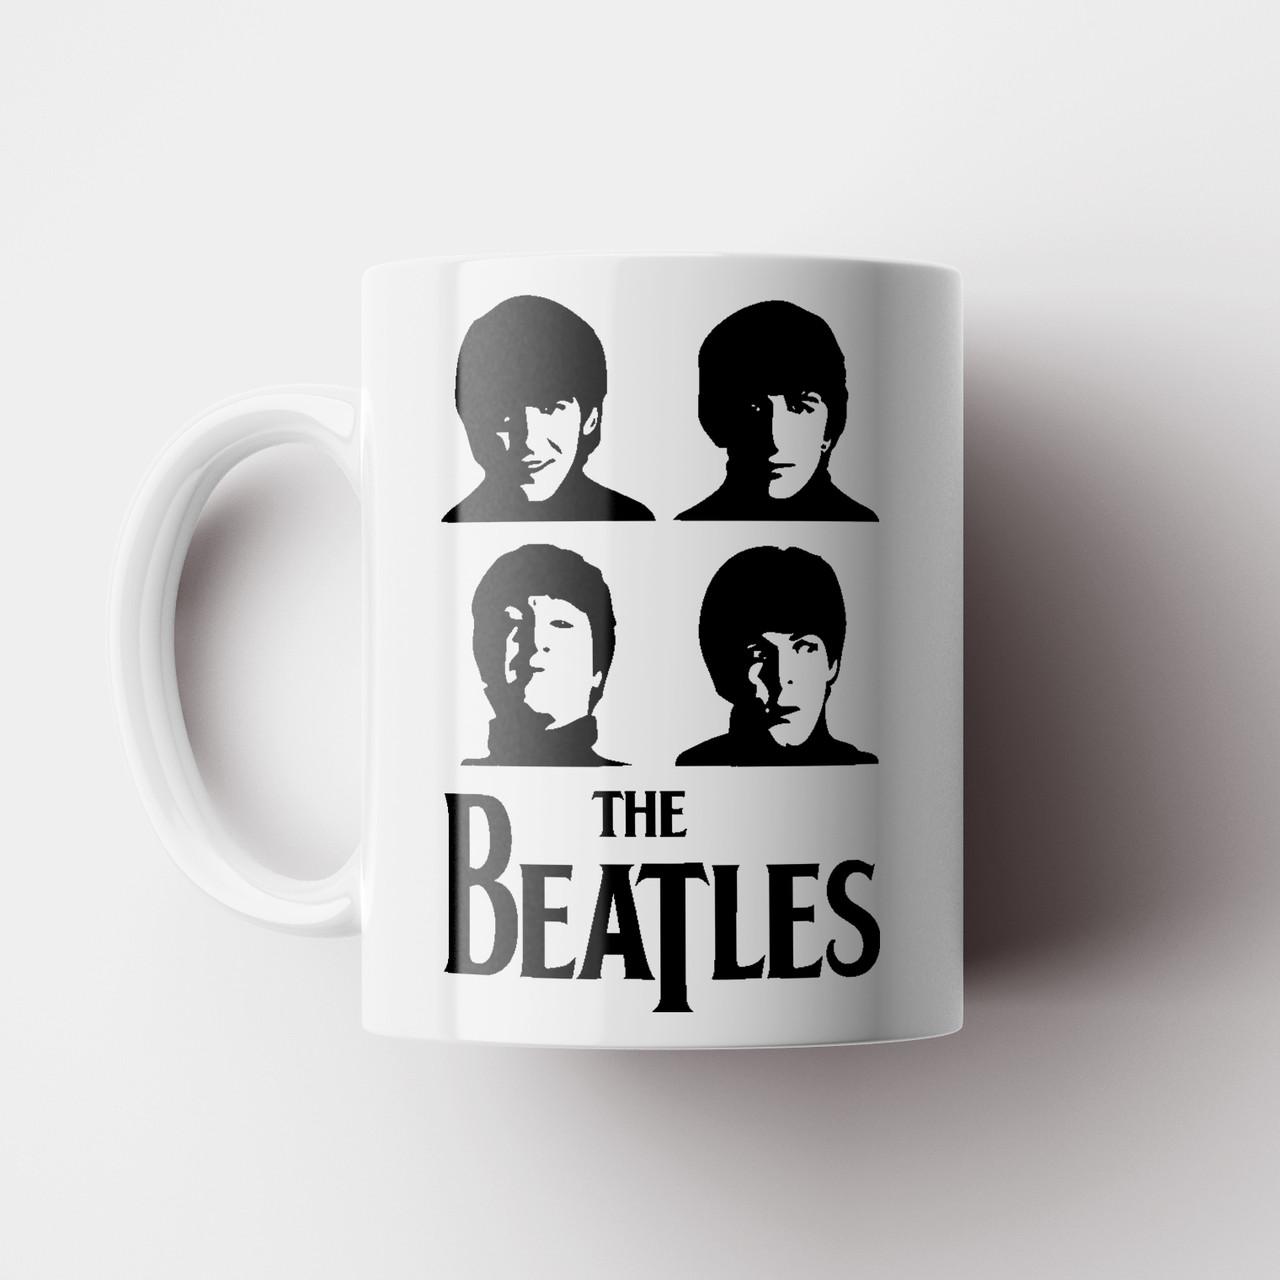 Чашка The Beatles. Битлз. Чашка с фото